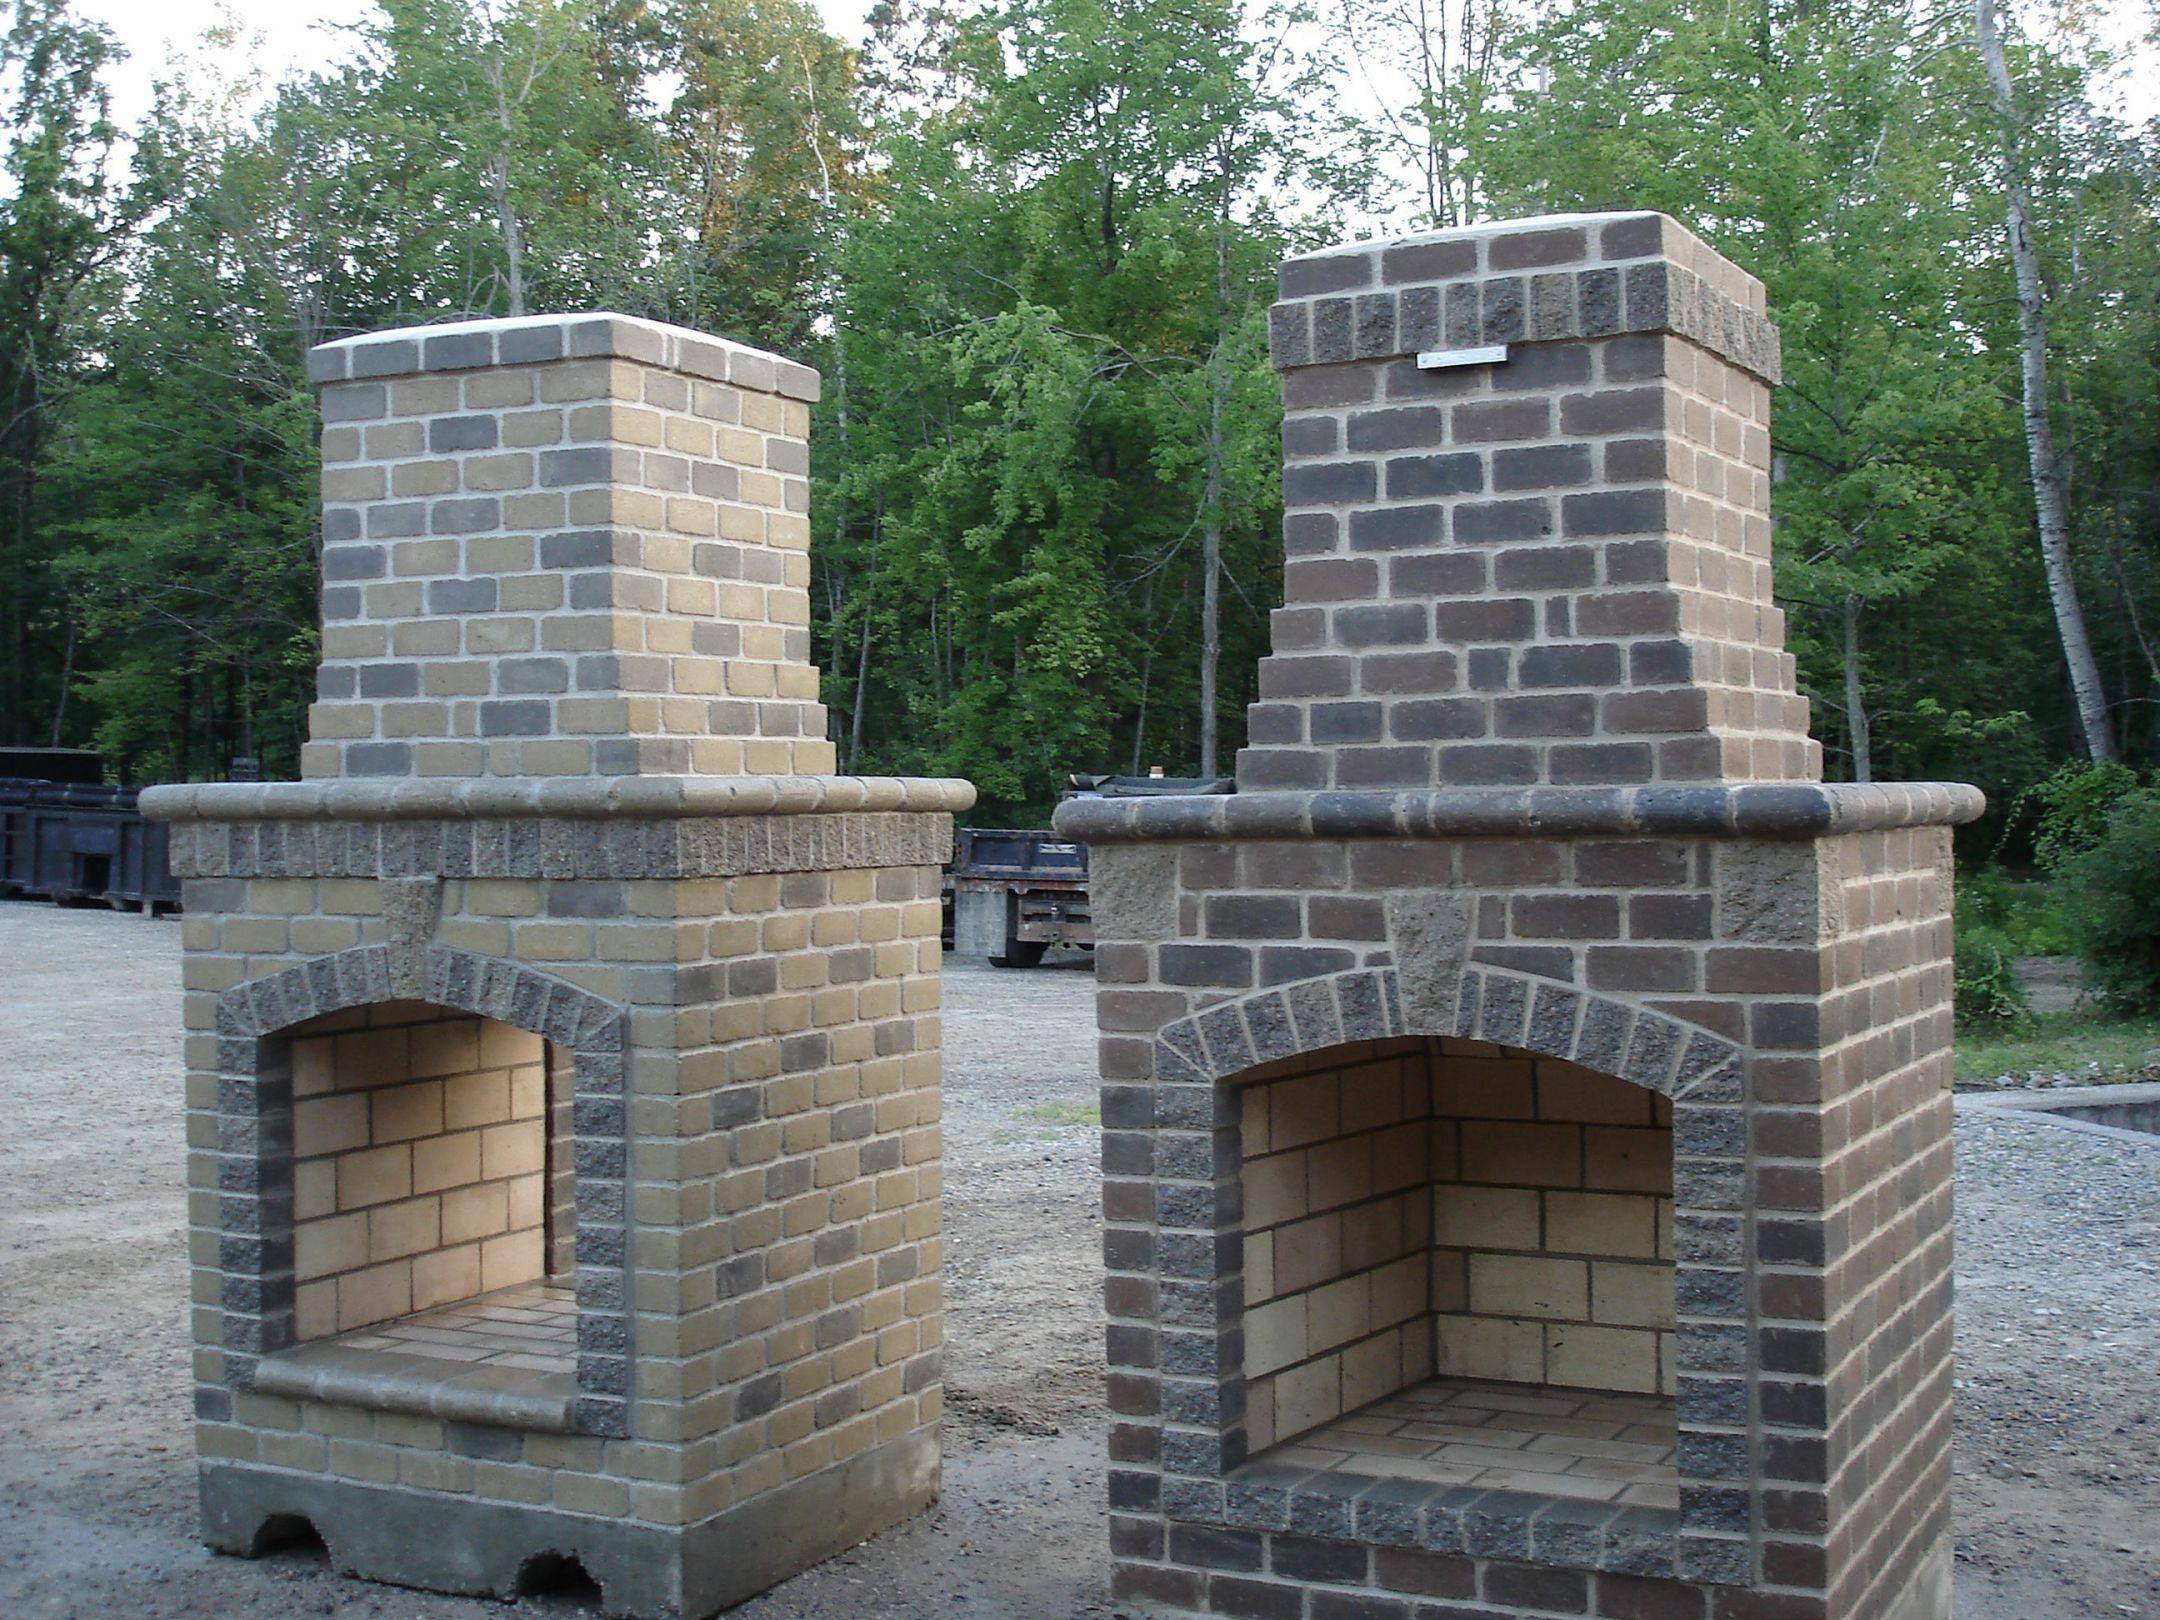 Brick Outdoor Fireplace Plans Brick Outdoor Fireplace Plans Design Ideas And Photos Outdoor Fireplace Plans Outdoor Fireplace Designs Diy Outdoor Fireplace